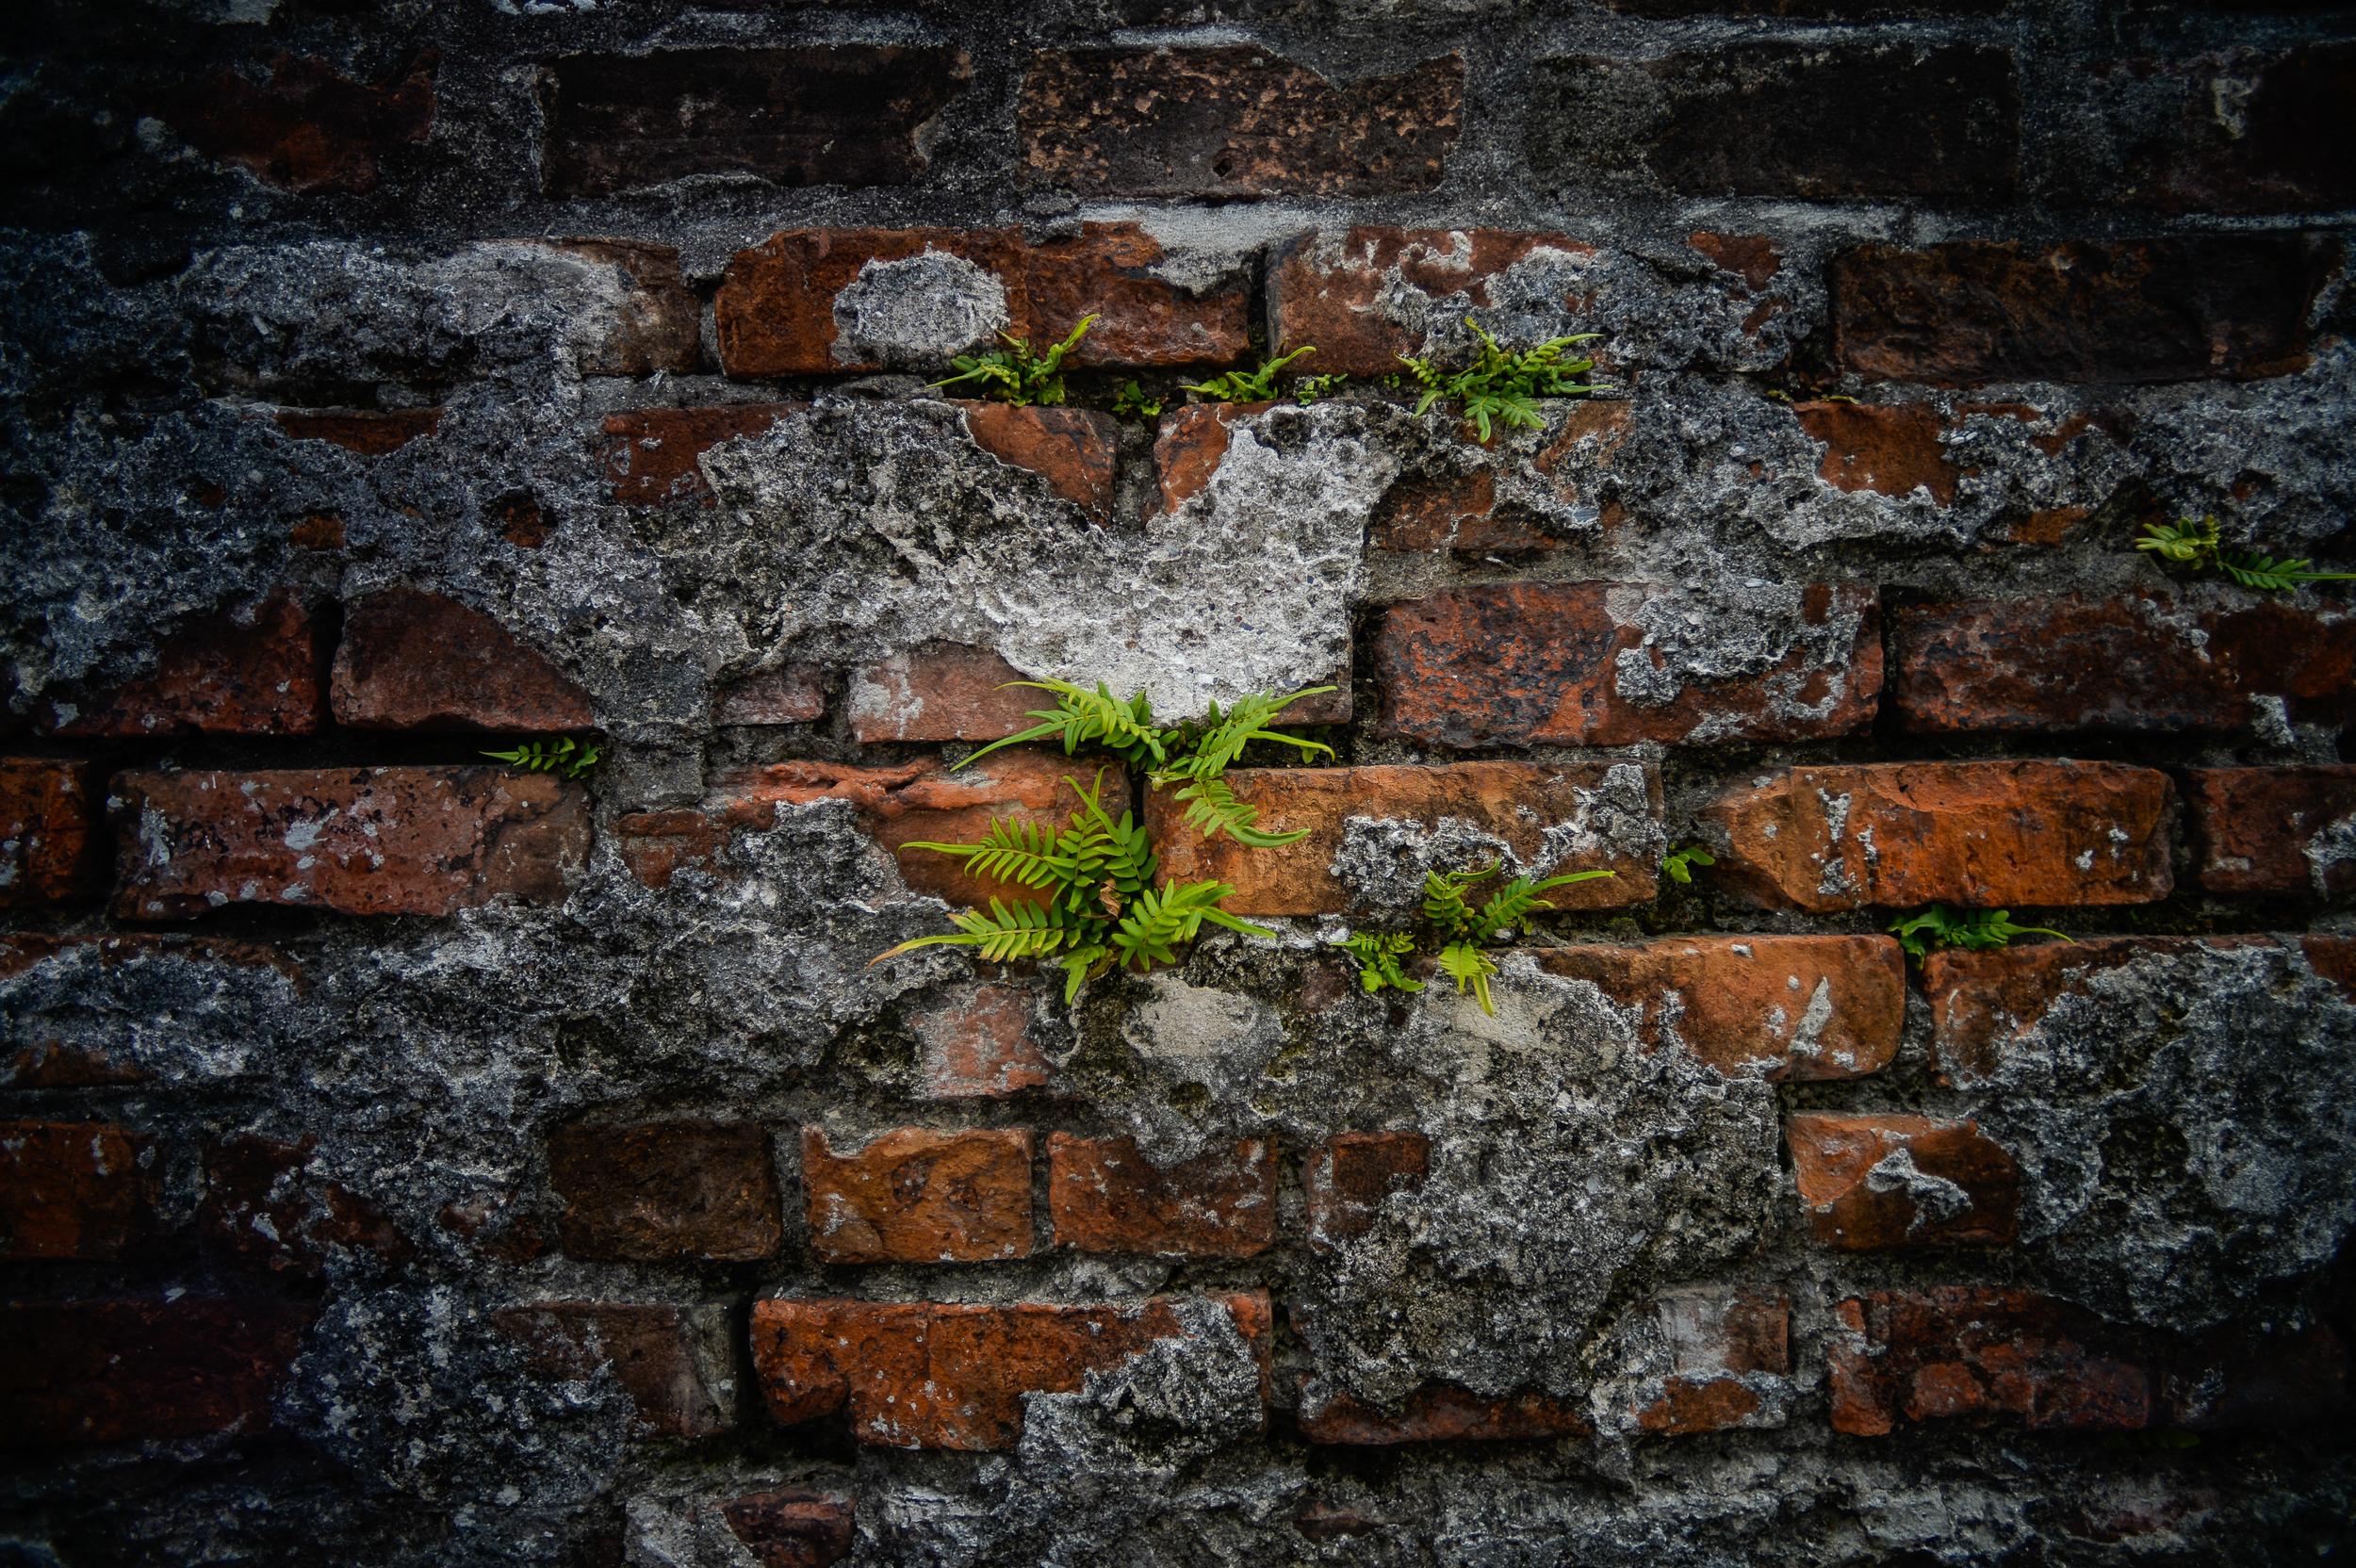 Crypt Ferns